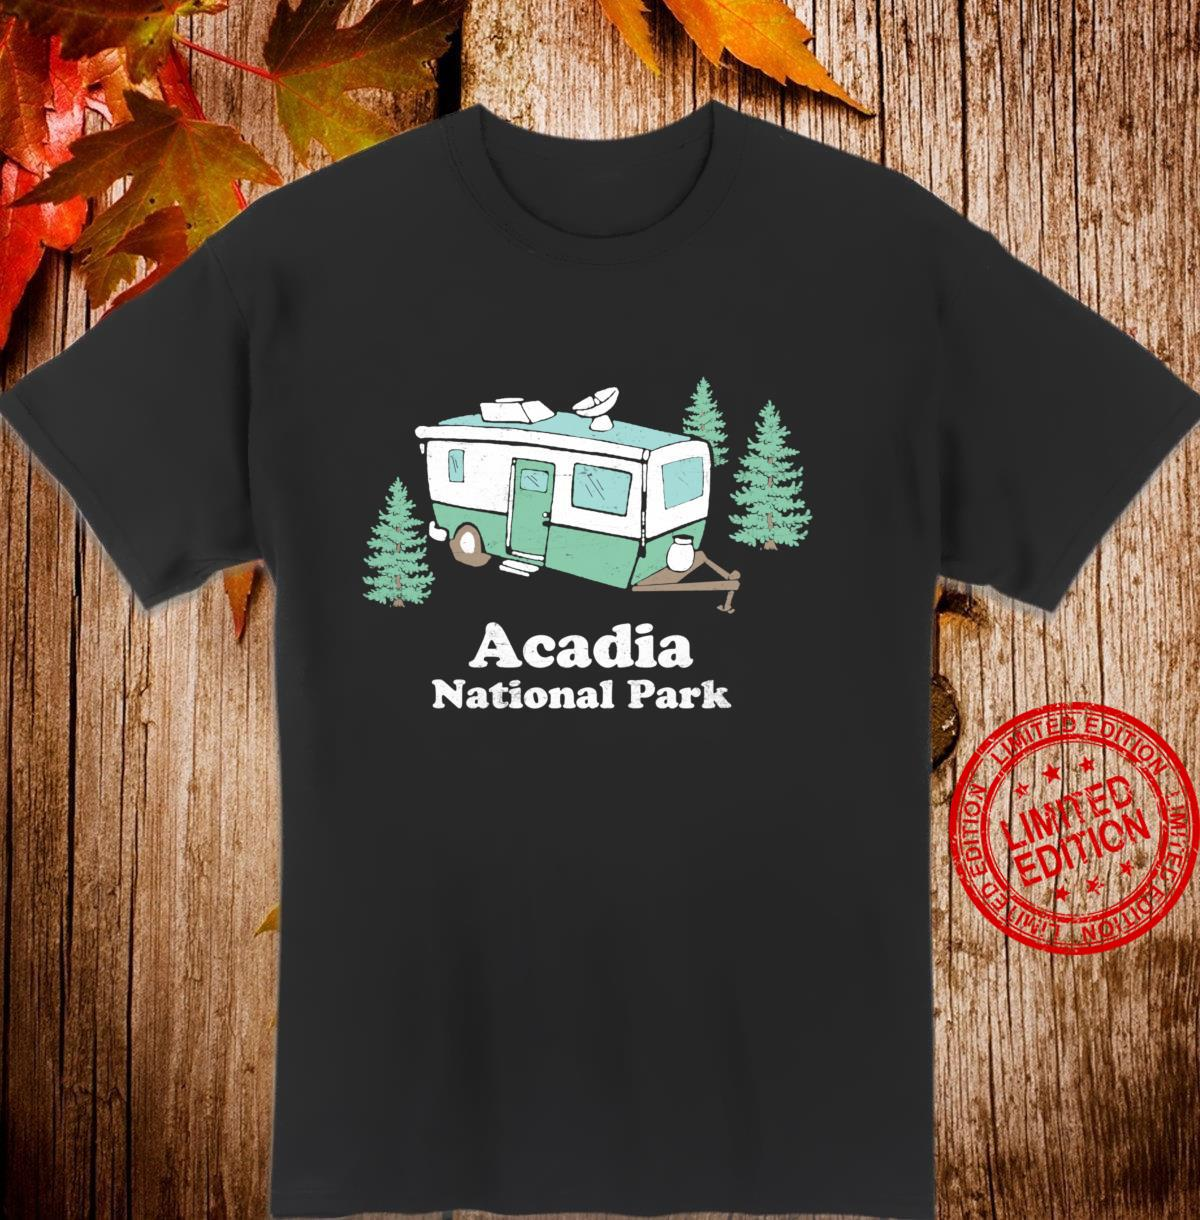 Acadia National Park Vintage RV Camper Retro Shirt